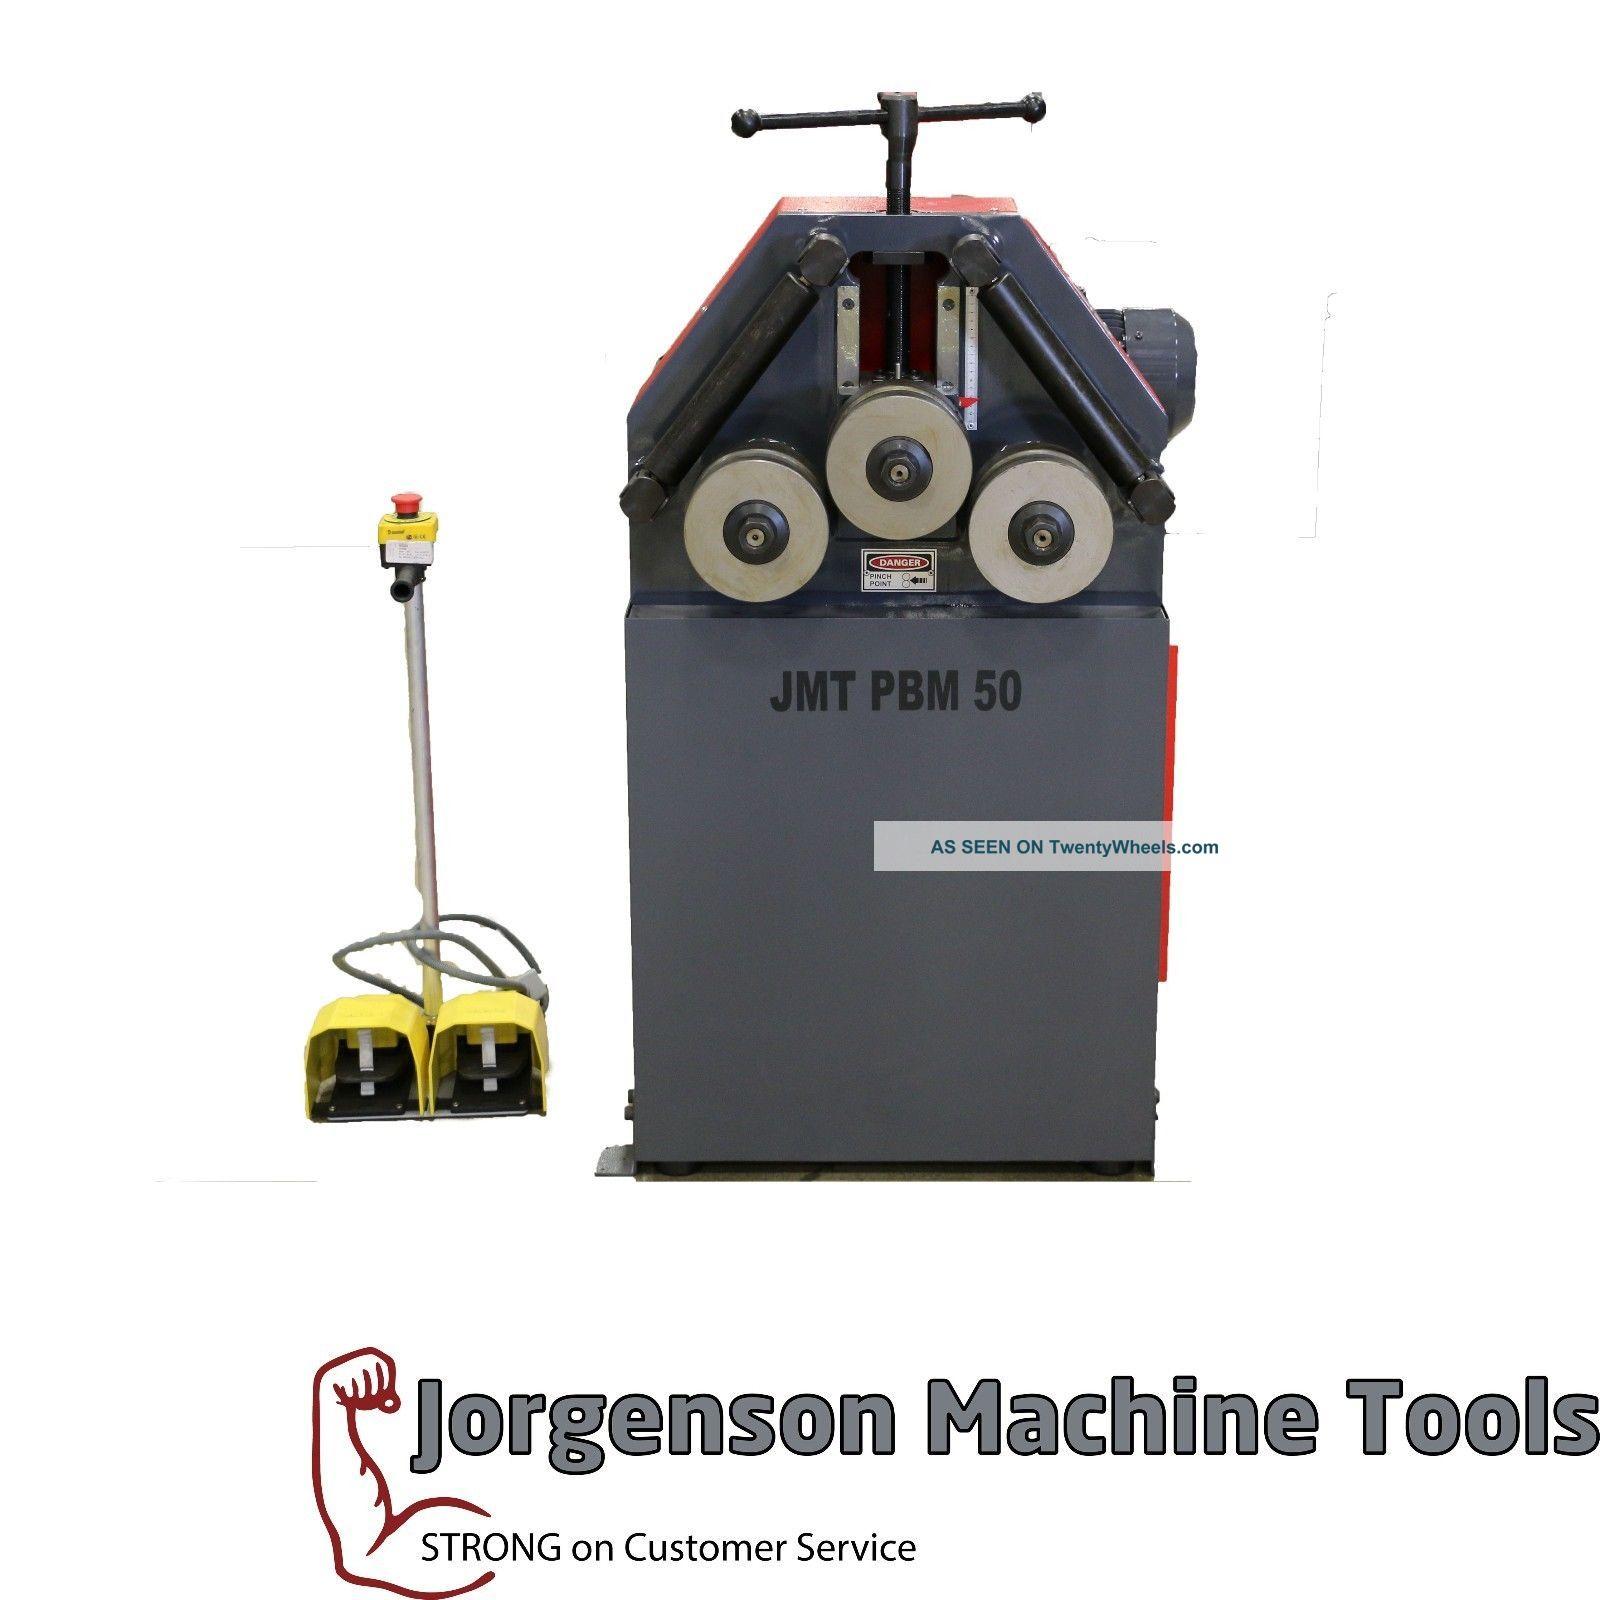 Jmt - Pbm 50 Mechanical Angle Roll Metal Bending Machines photo